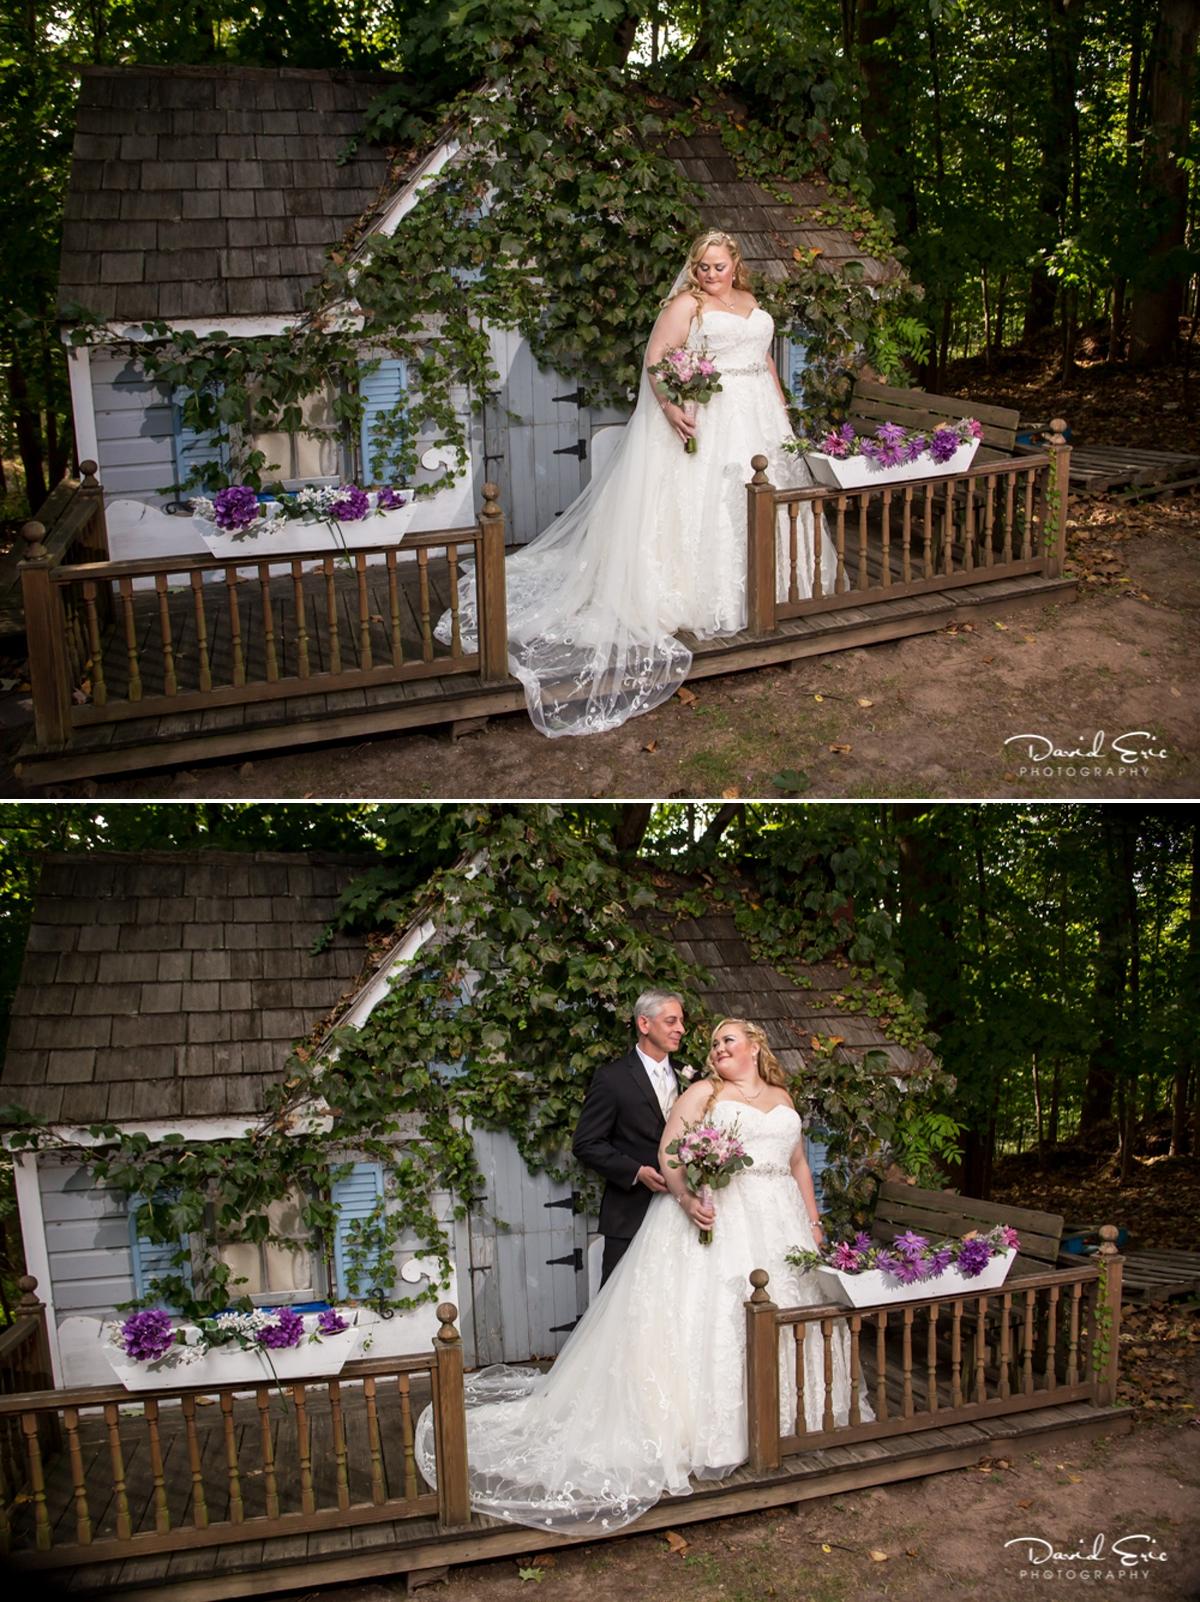 kronyak-wedding-david-eric-photography-woodcliff-lake-new-jersey-11